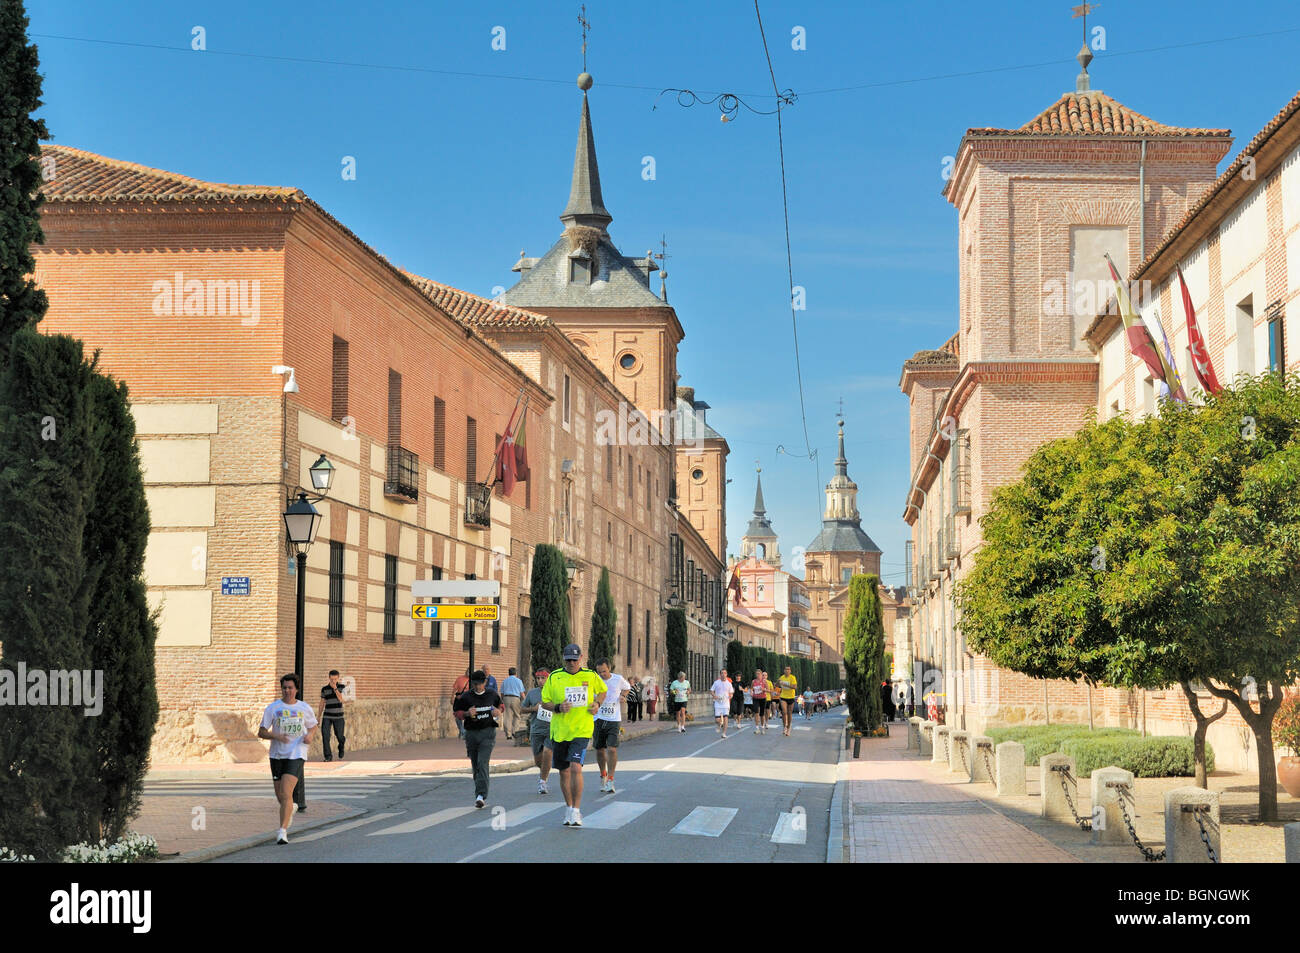 Runners competing in the Alcala 10k marathon, Alcala de Henares, Madrid province, Spain - Stock Image